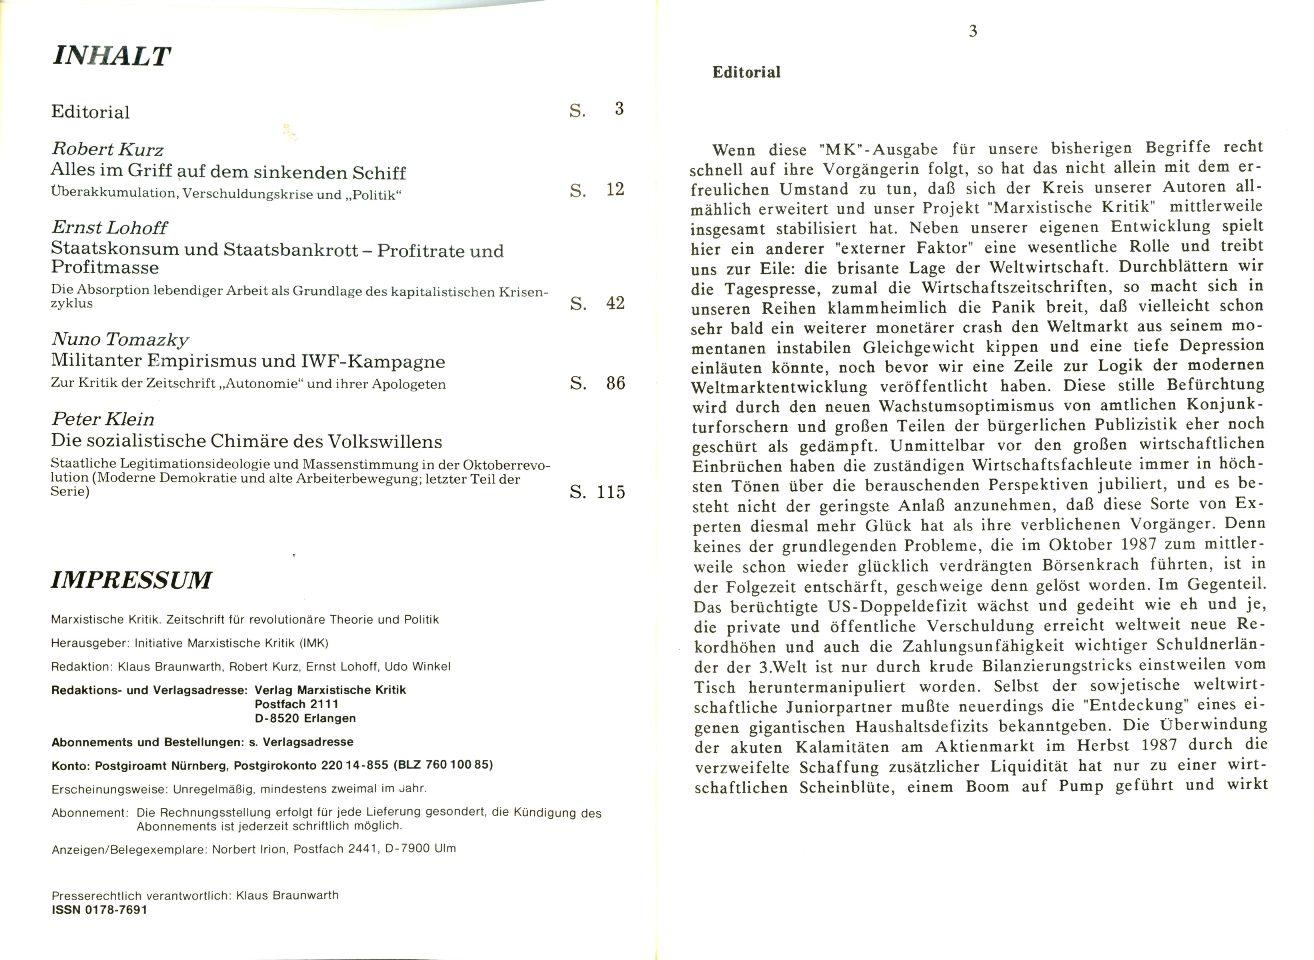 Erlangen_VMK_MK_1989_06_002